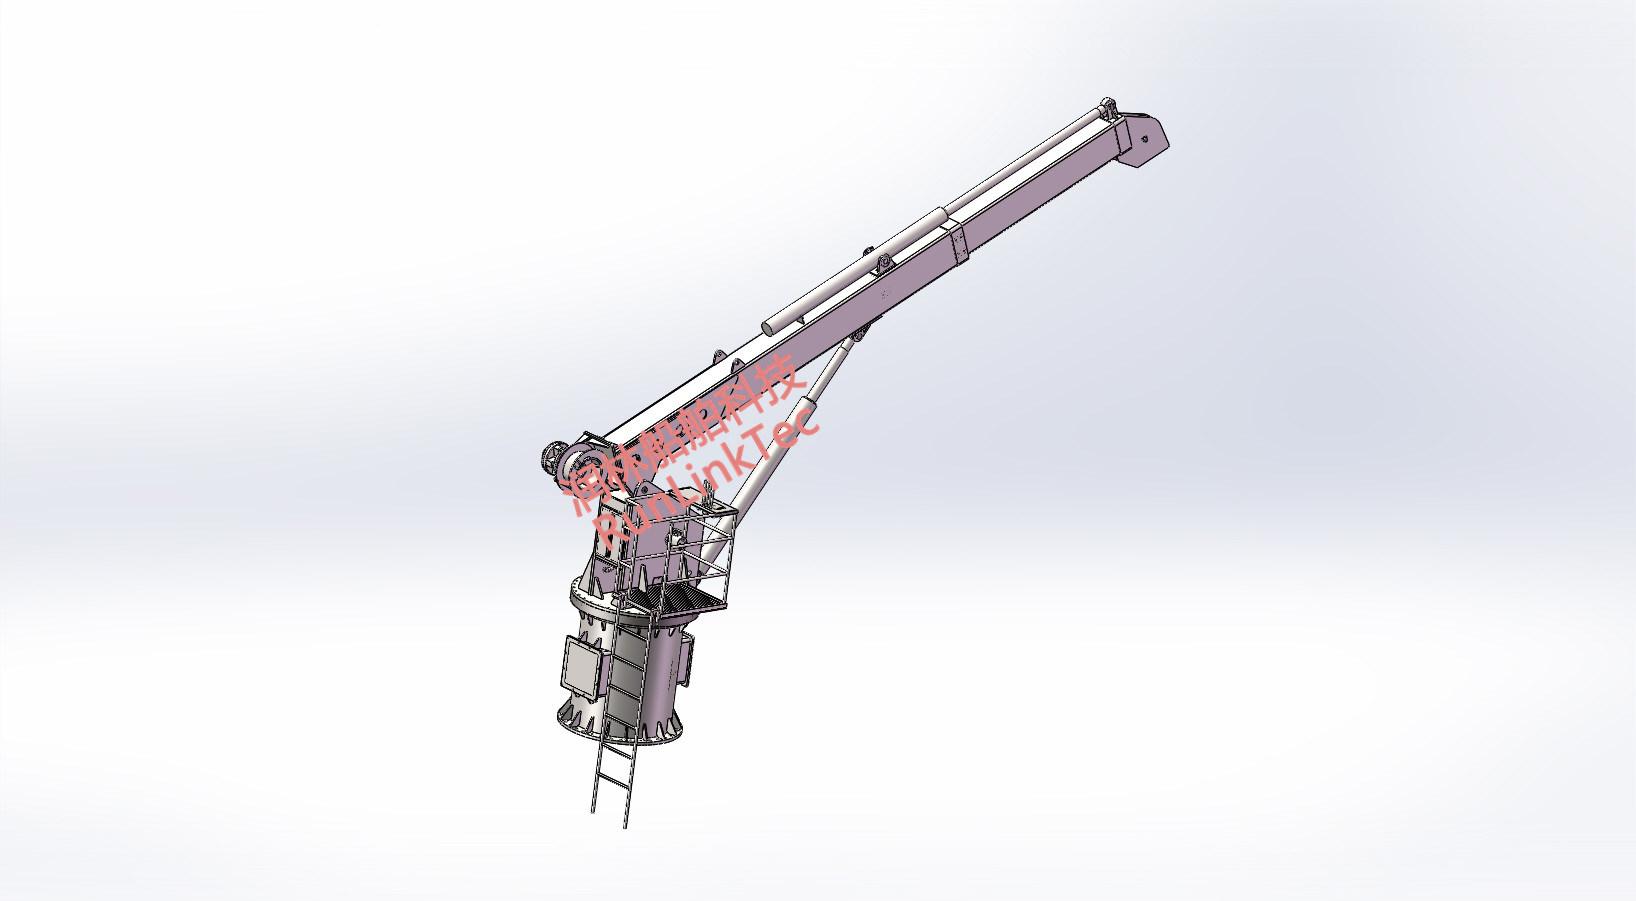 Marine General Crane Telescopic Knuckle